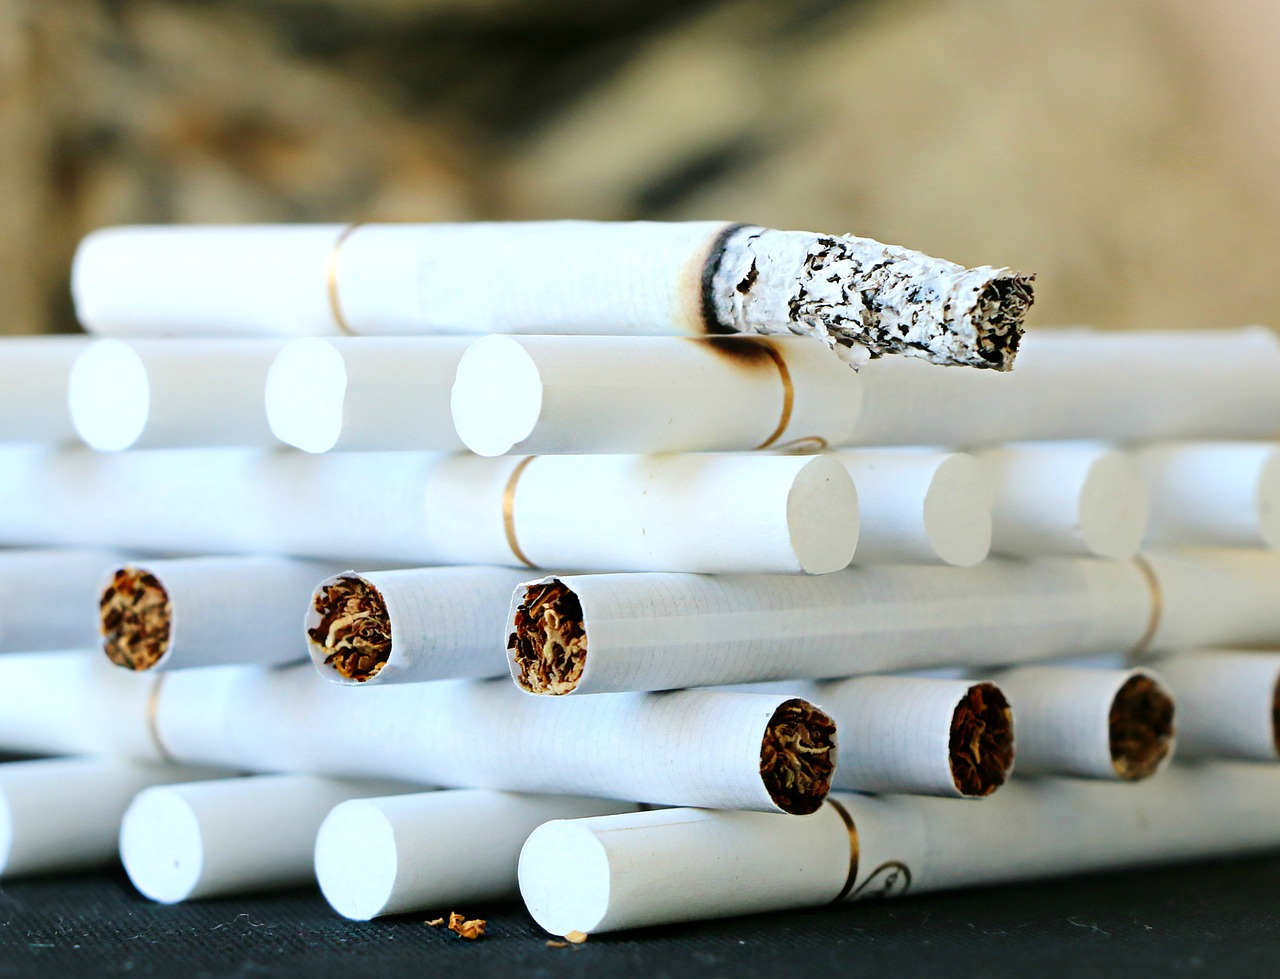 Le tabac a reculé en France en 2016